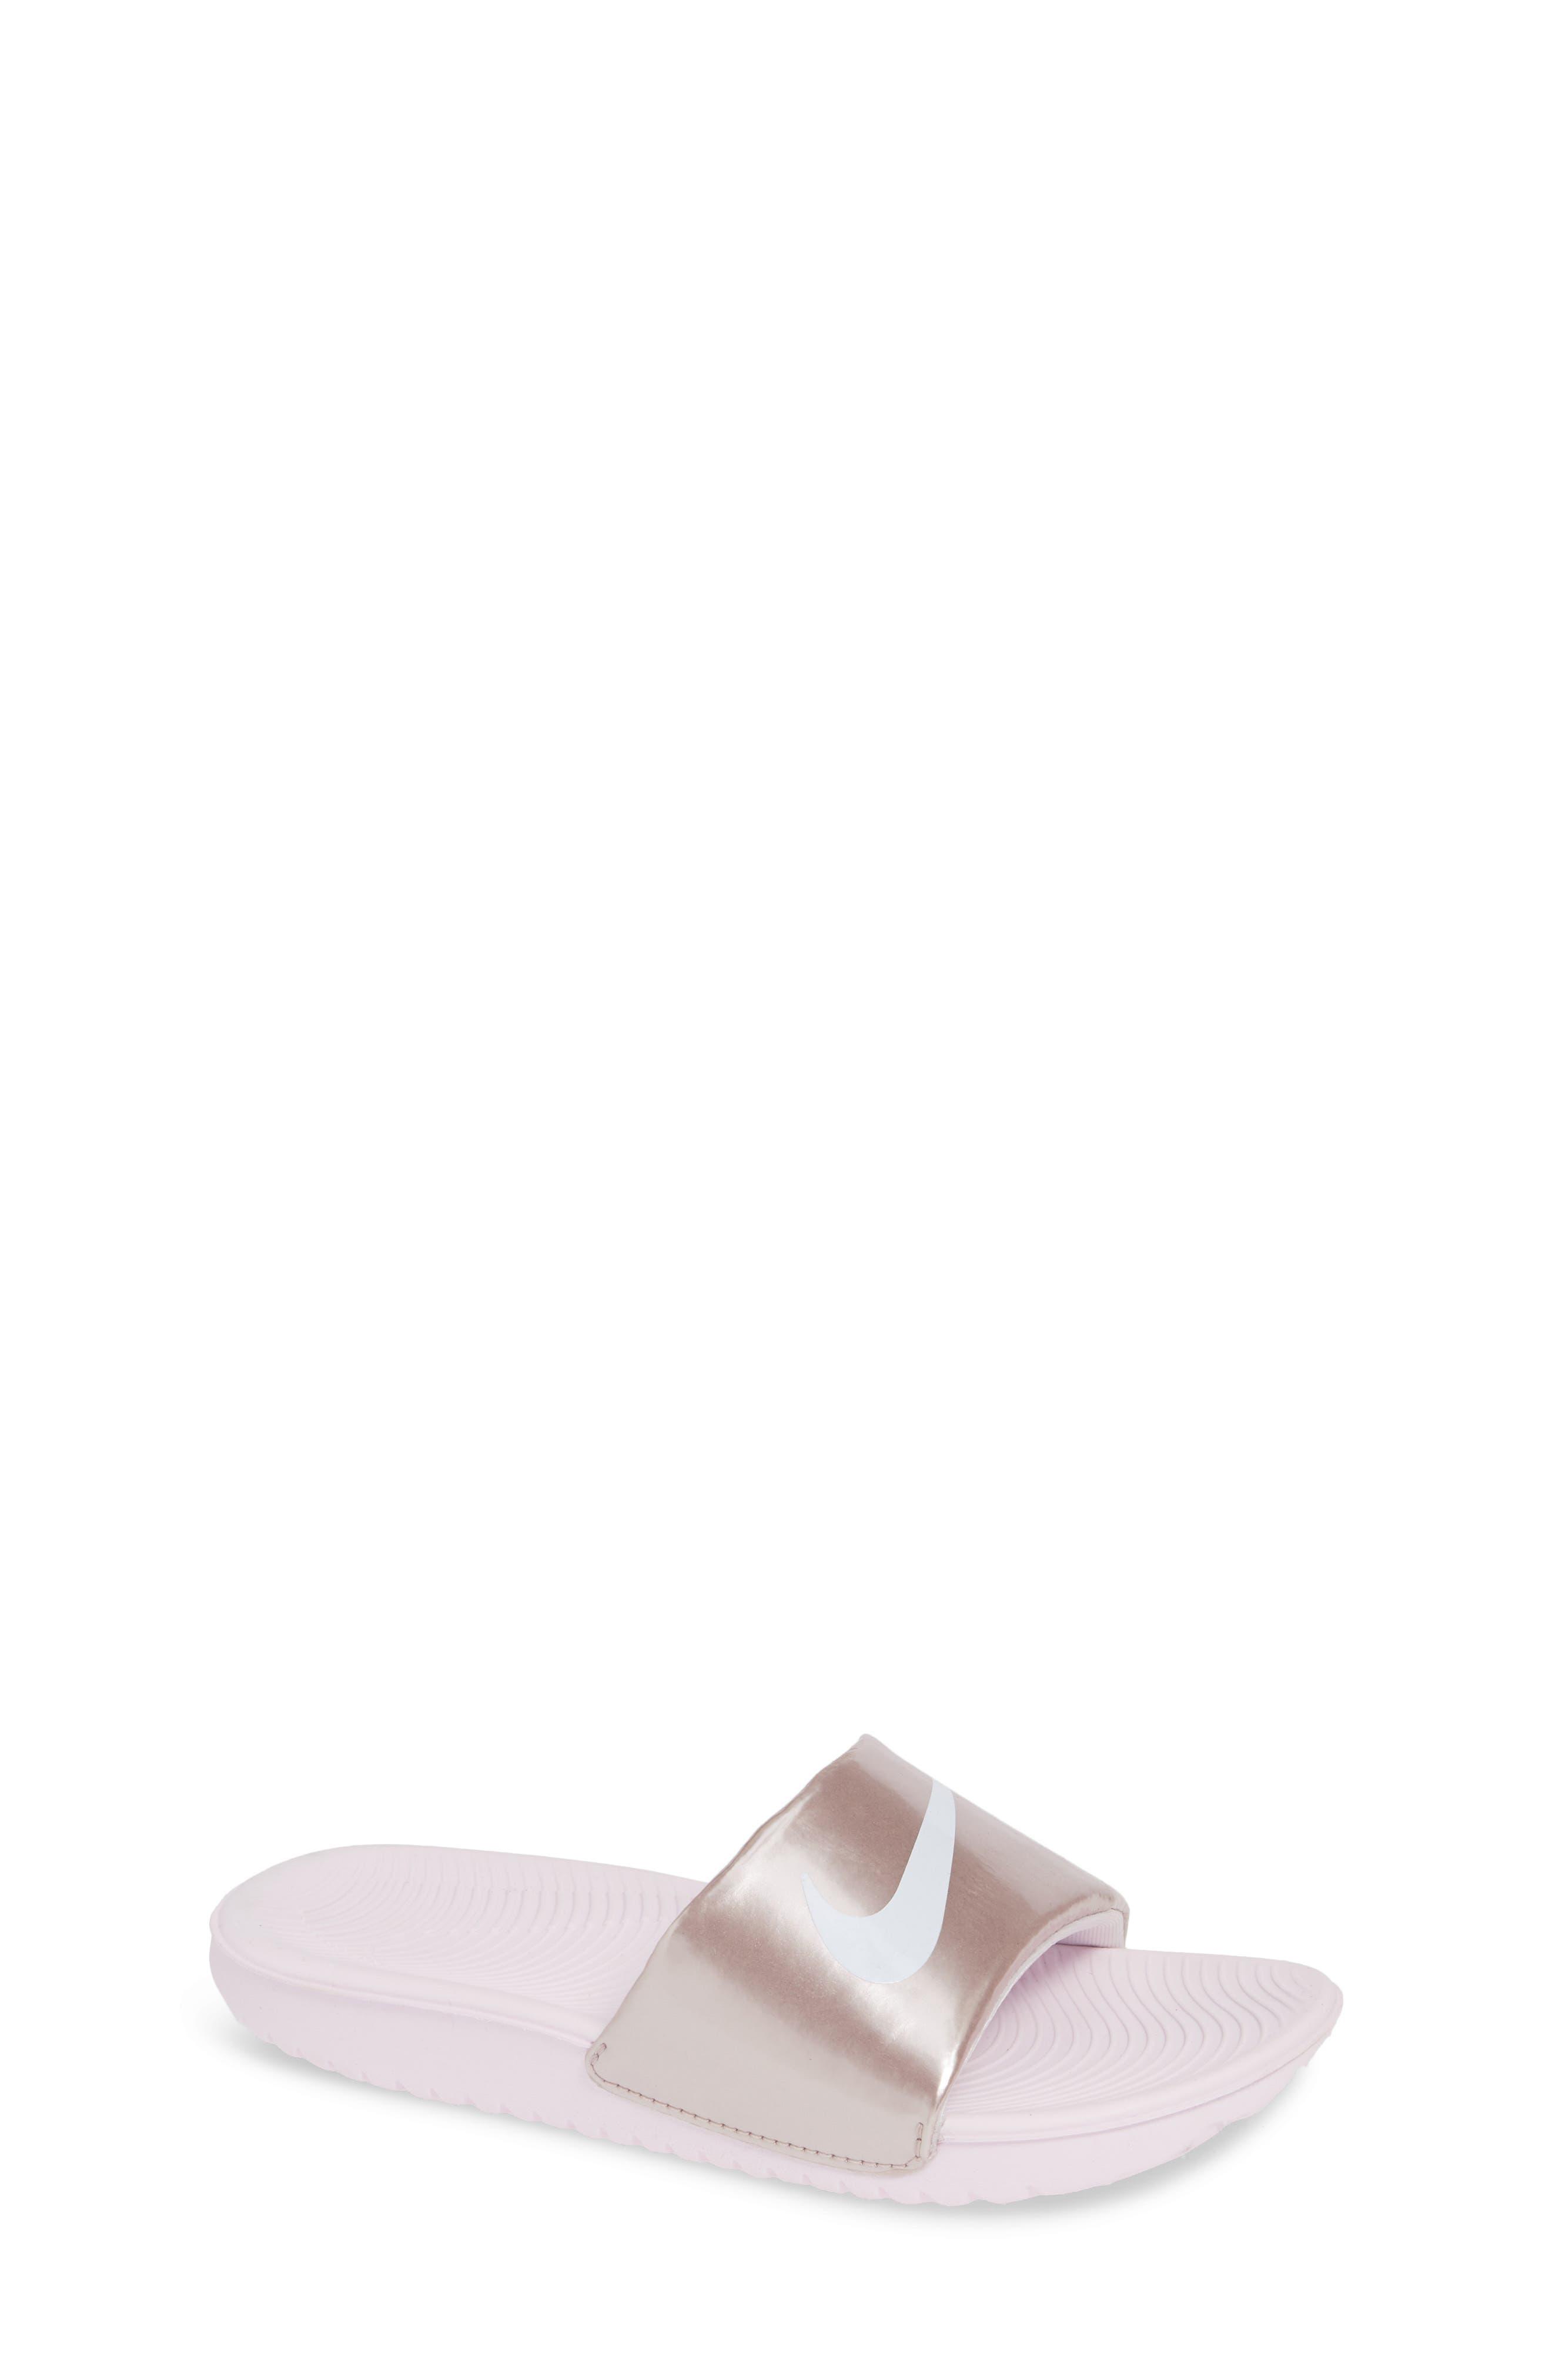 best loved ca13e 074d3 nike sandals   Nordstrom